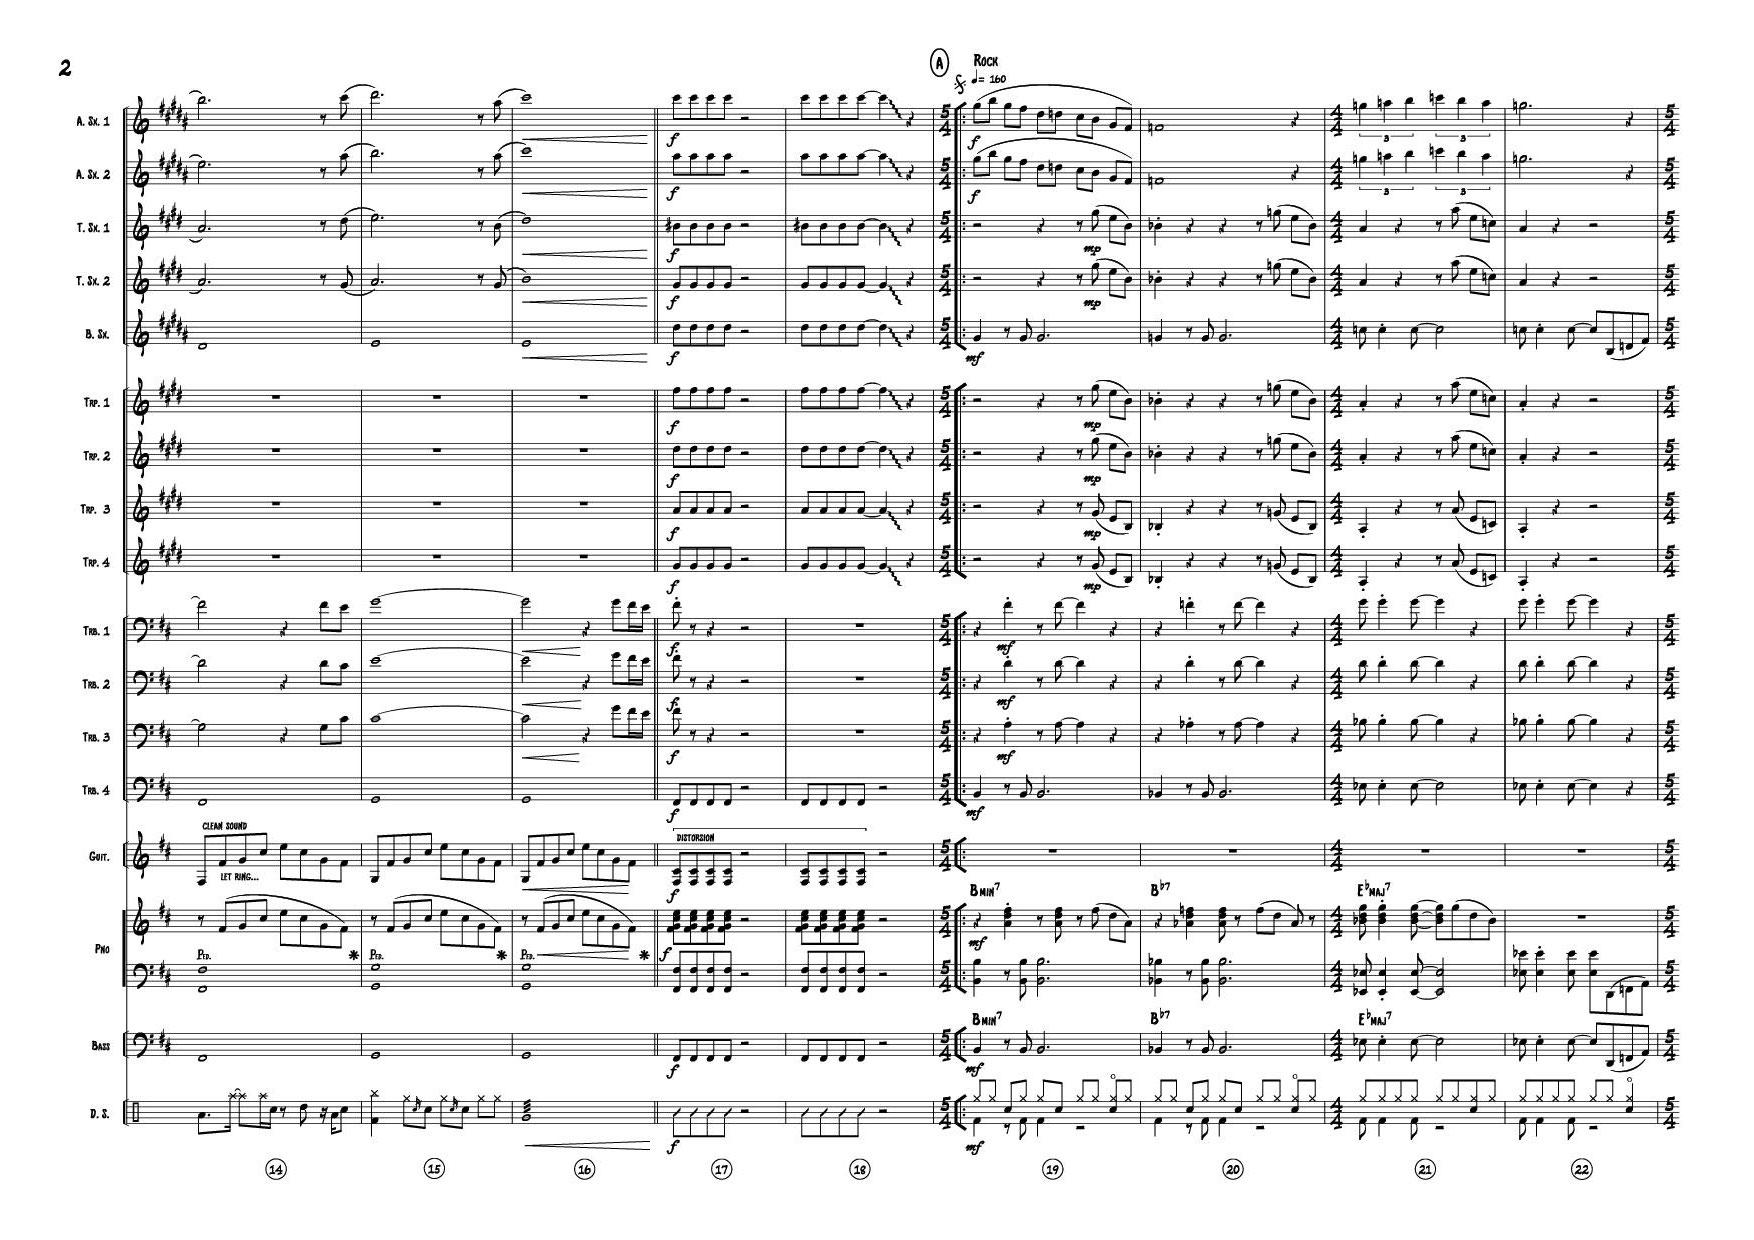 FORMATION JAZZ - BIG BAND-Guten tag Stravinsky-Bergeron